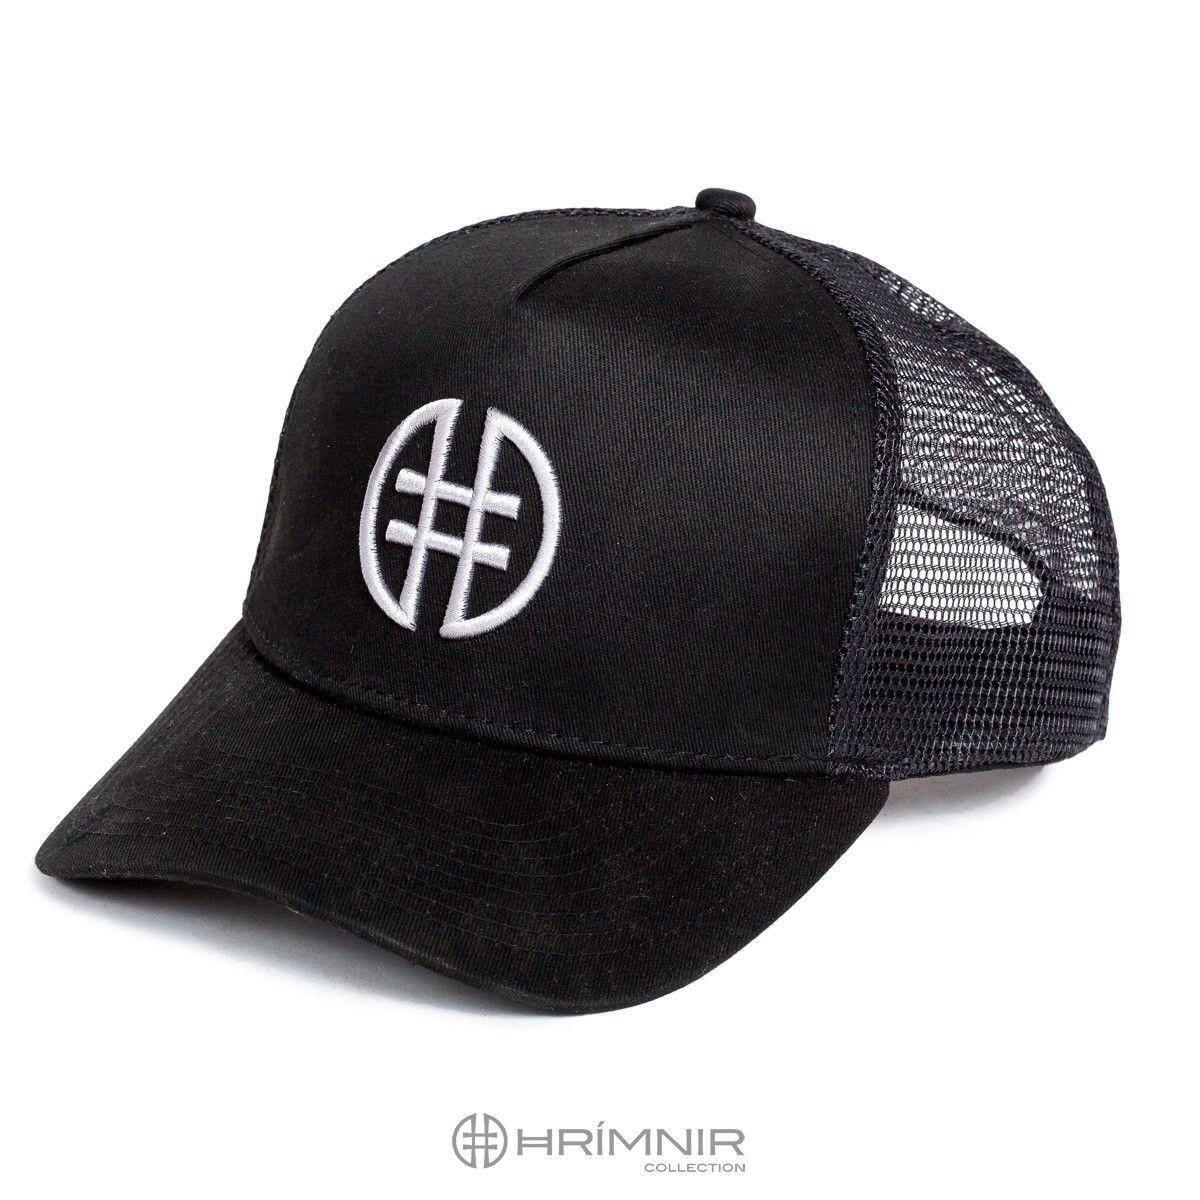 Baseball-Kappe mit Netz